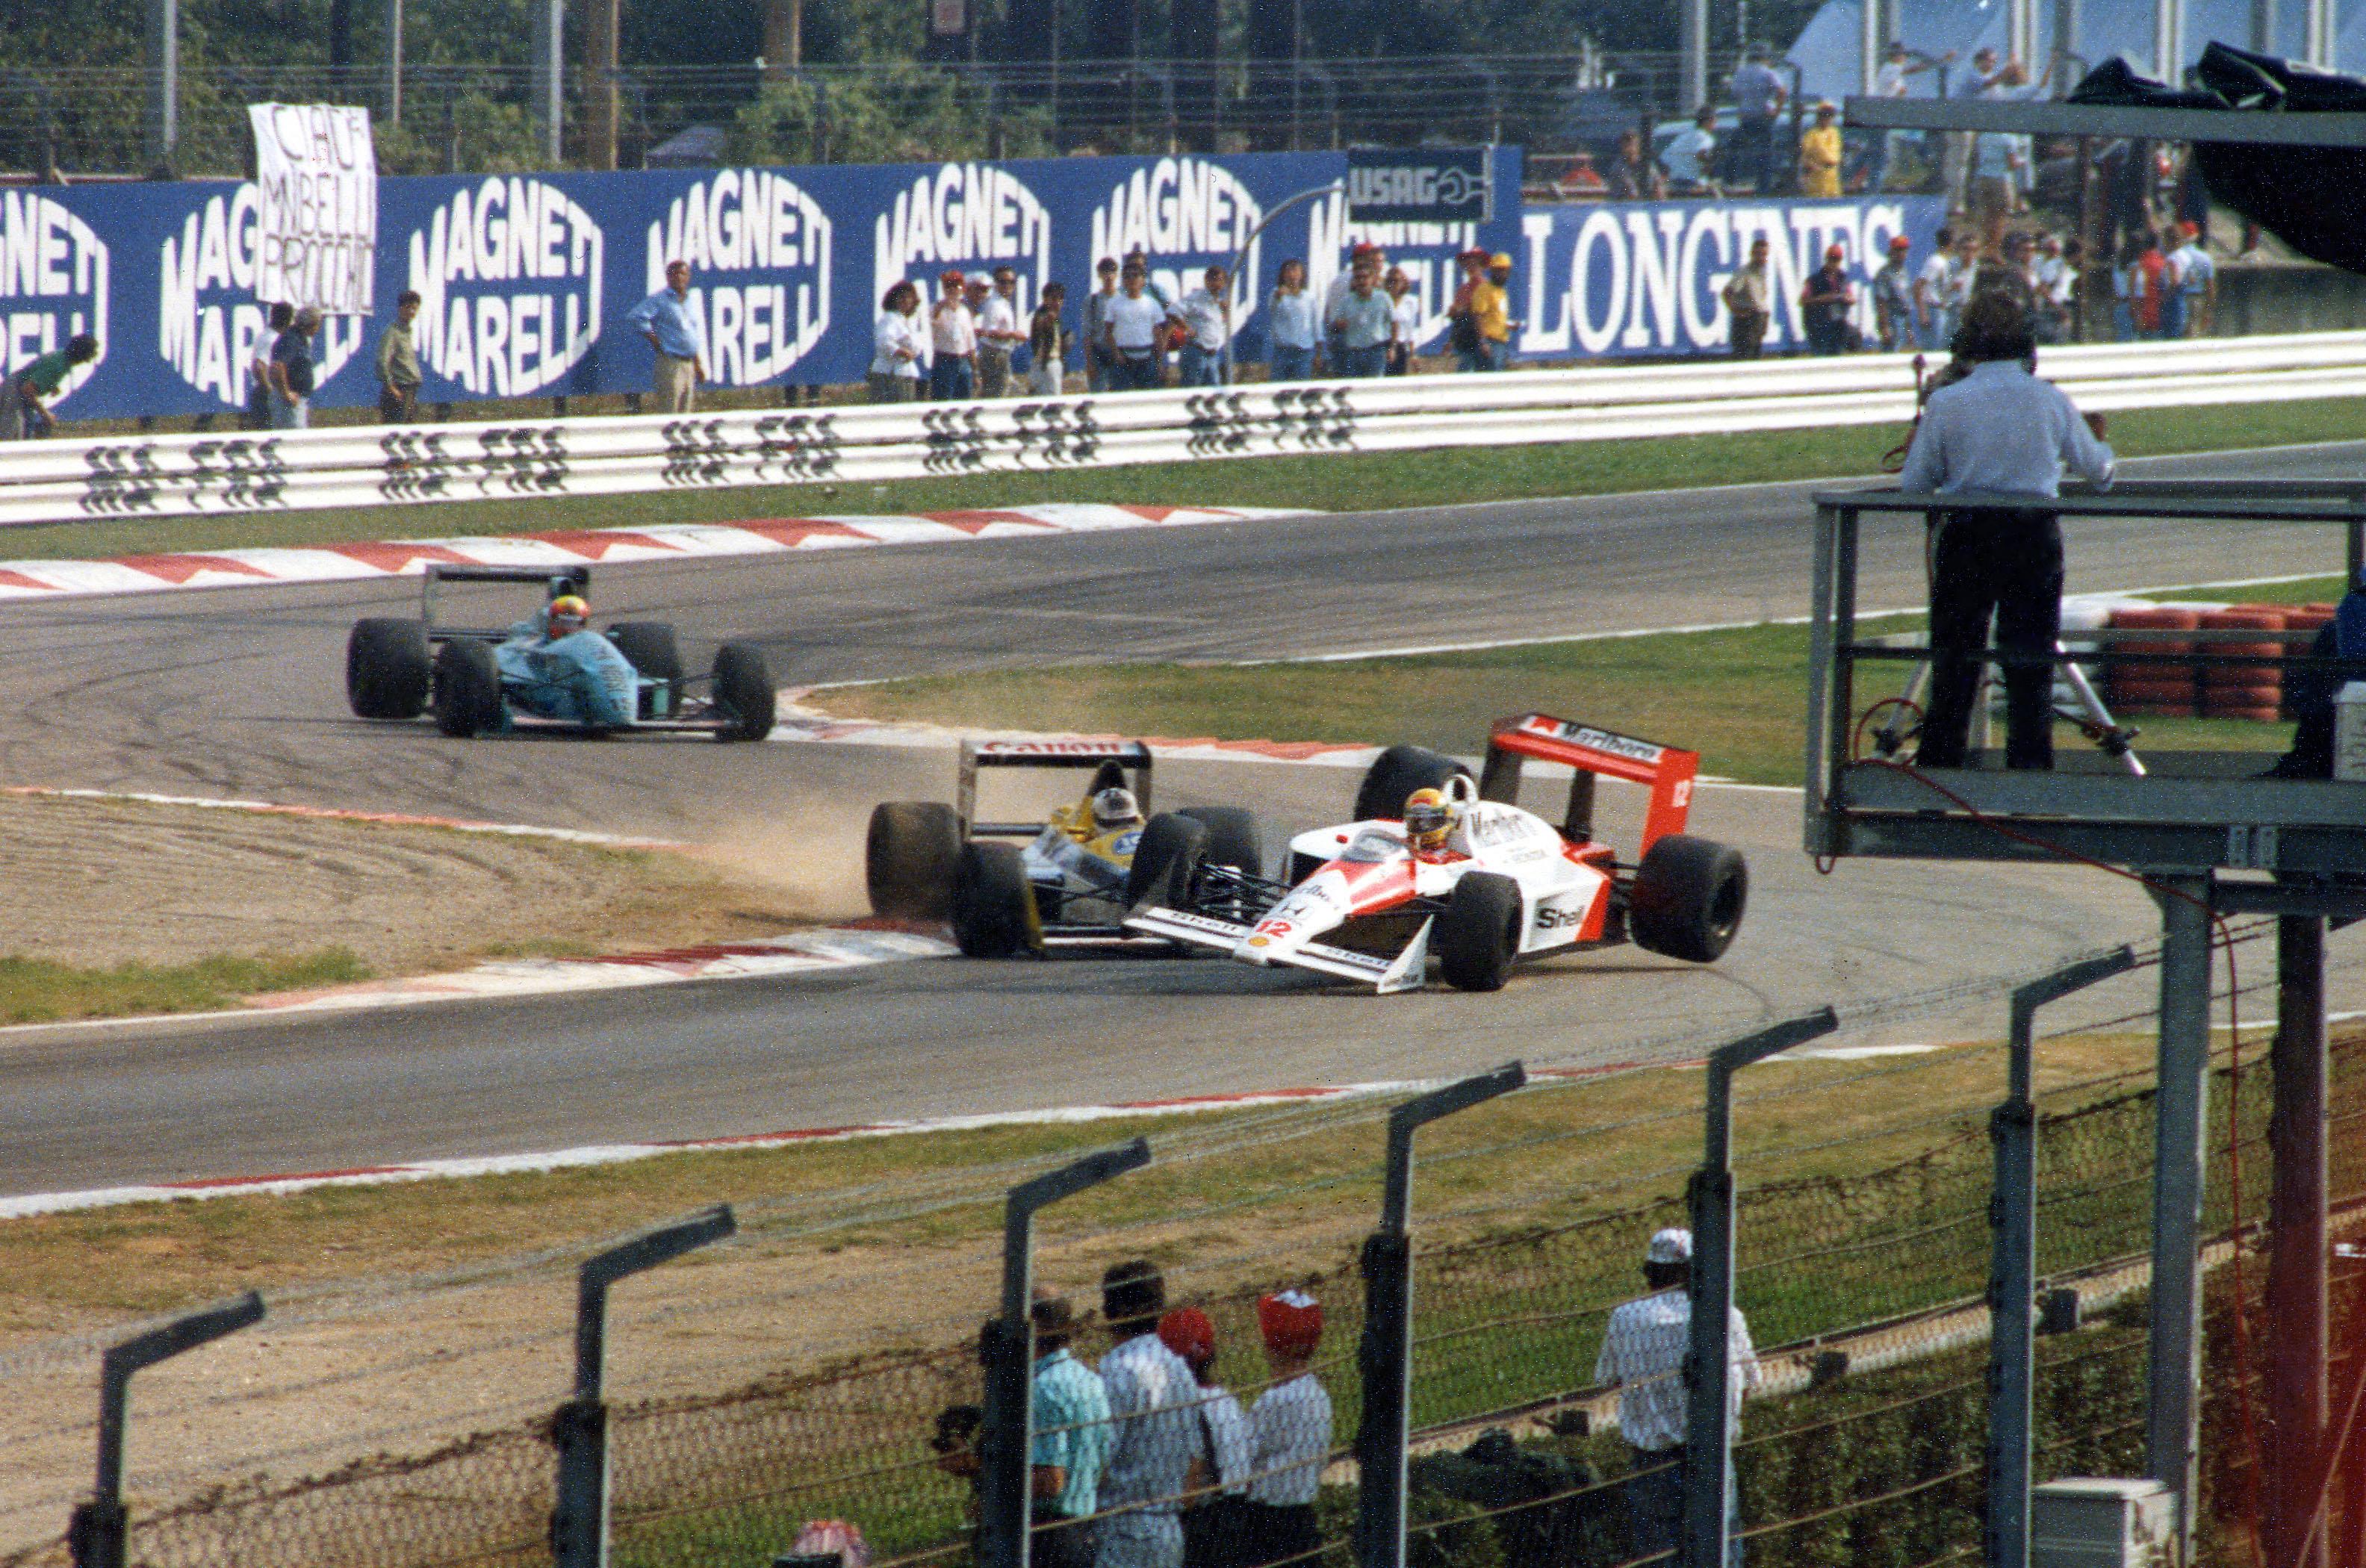 Jean-Louis Schlesser Ayrton Senna collision Monza Italian Grand Prix 1988 McLaren Williams F1